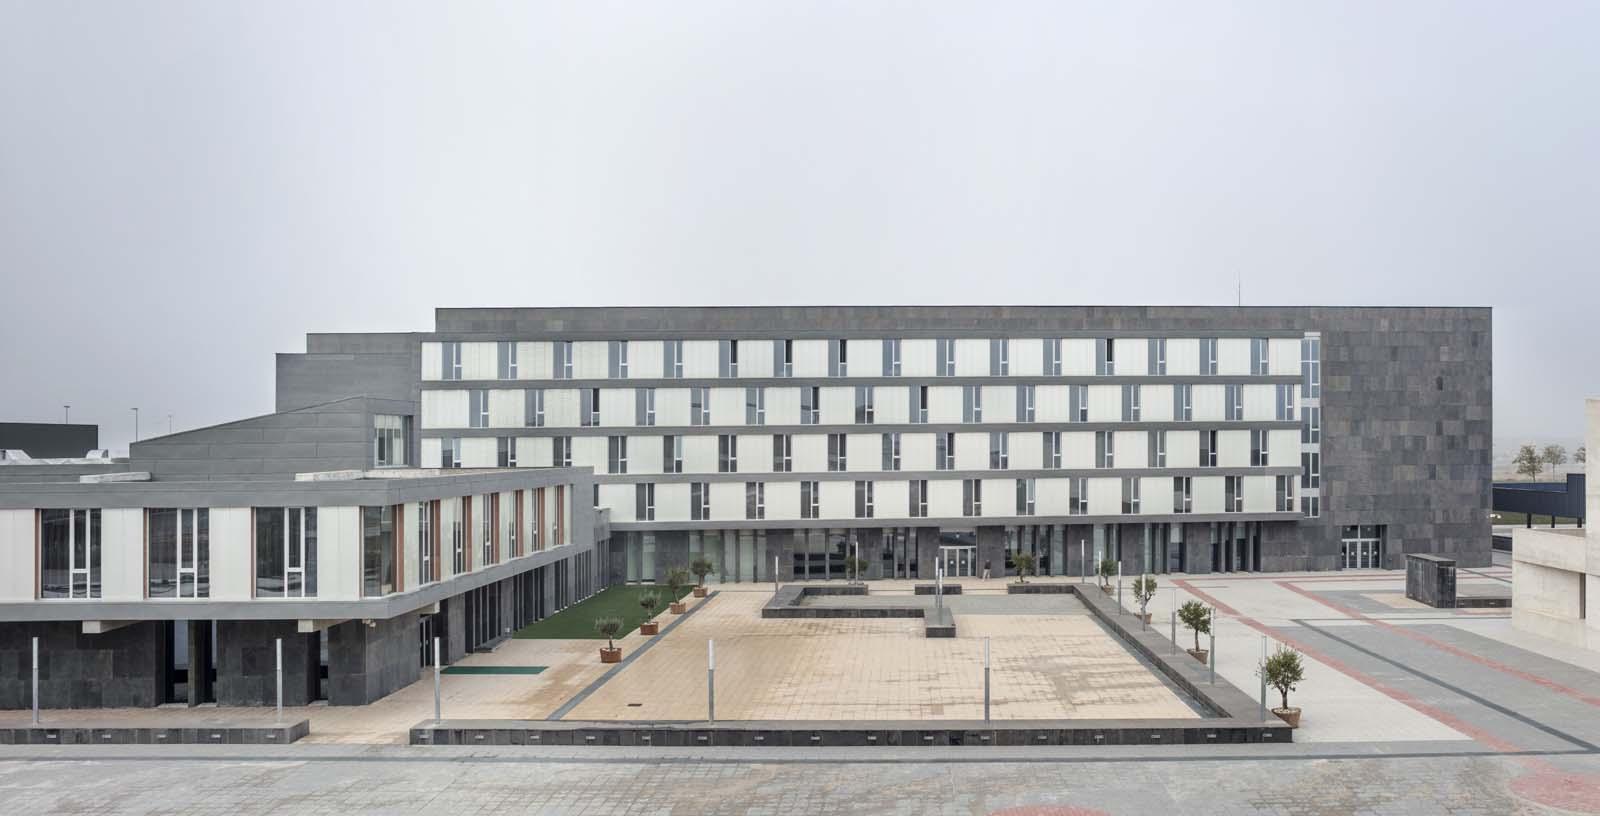 Diagonal_Plaza_Hotel_01_Architecture_Idom_photos_Aitor_Ortiz